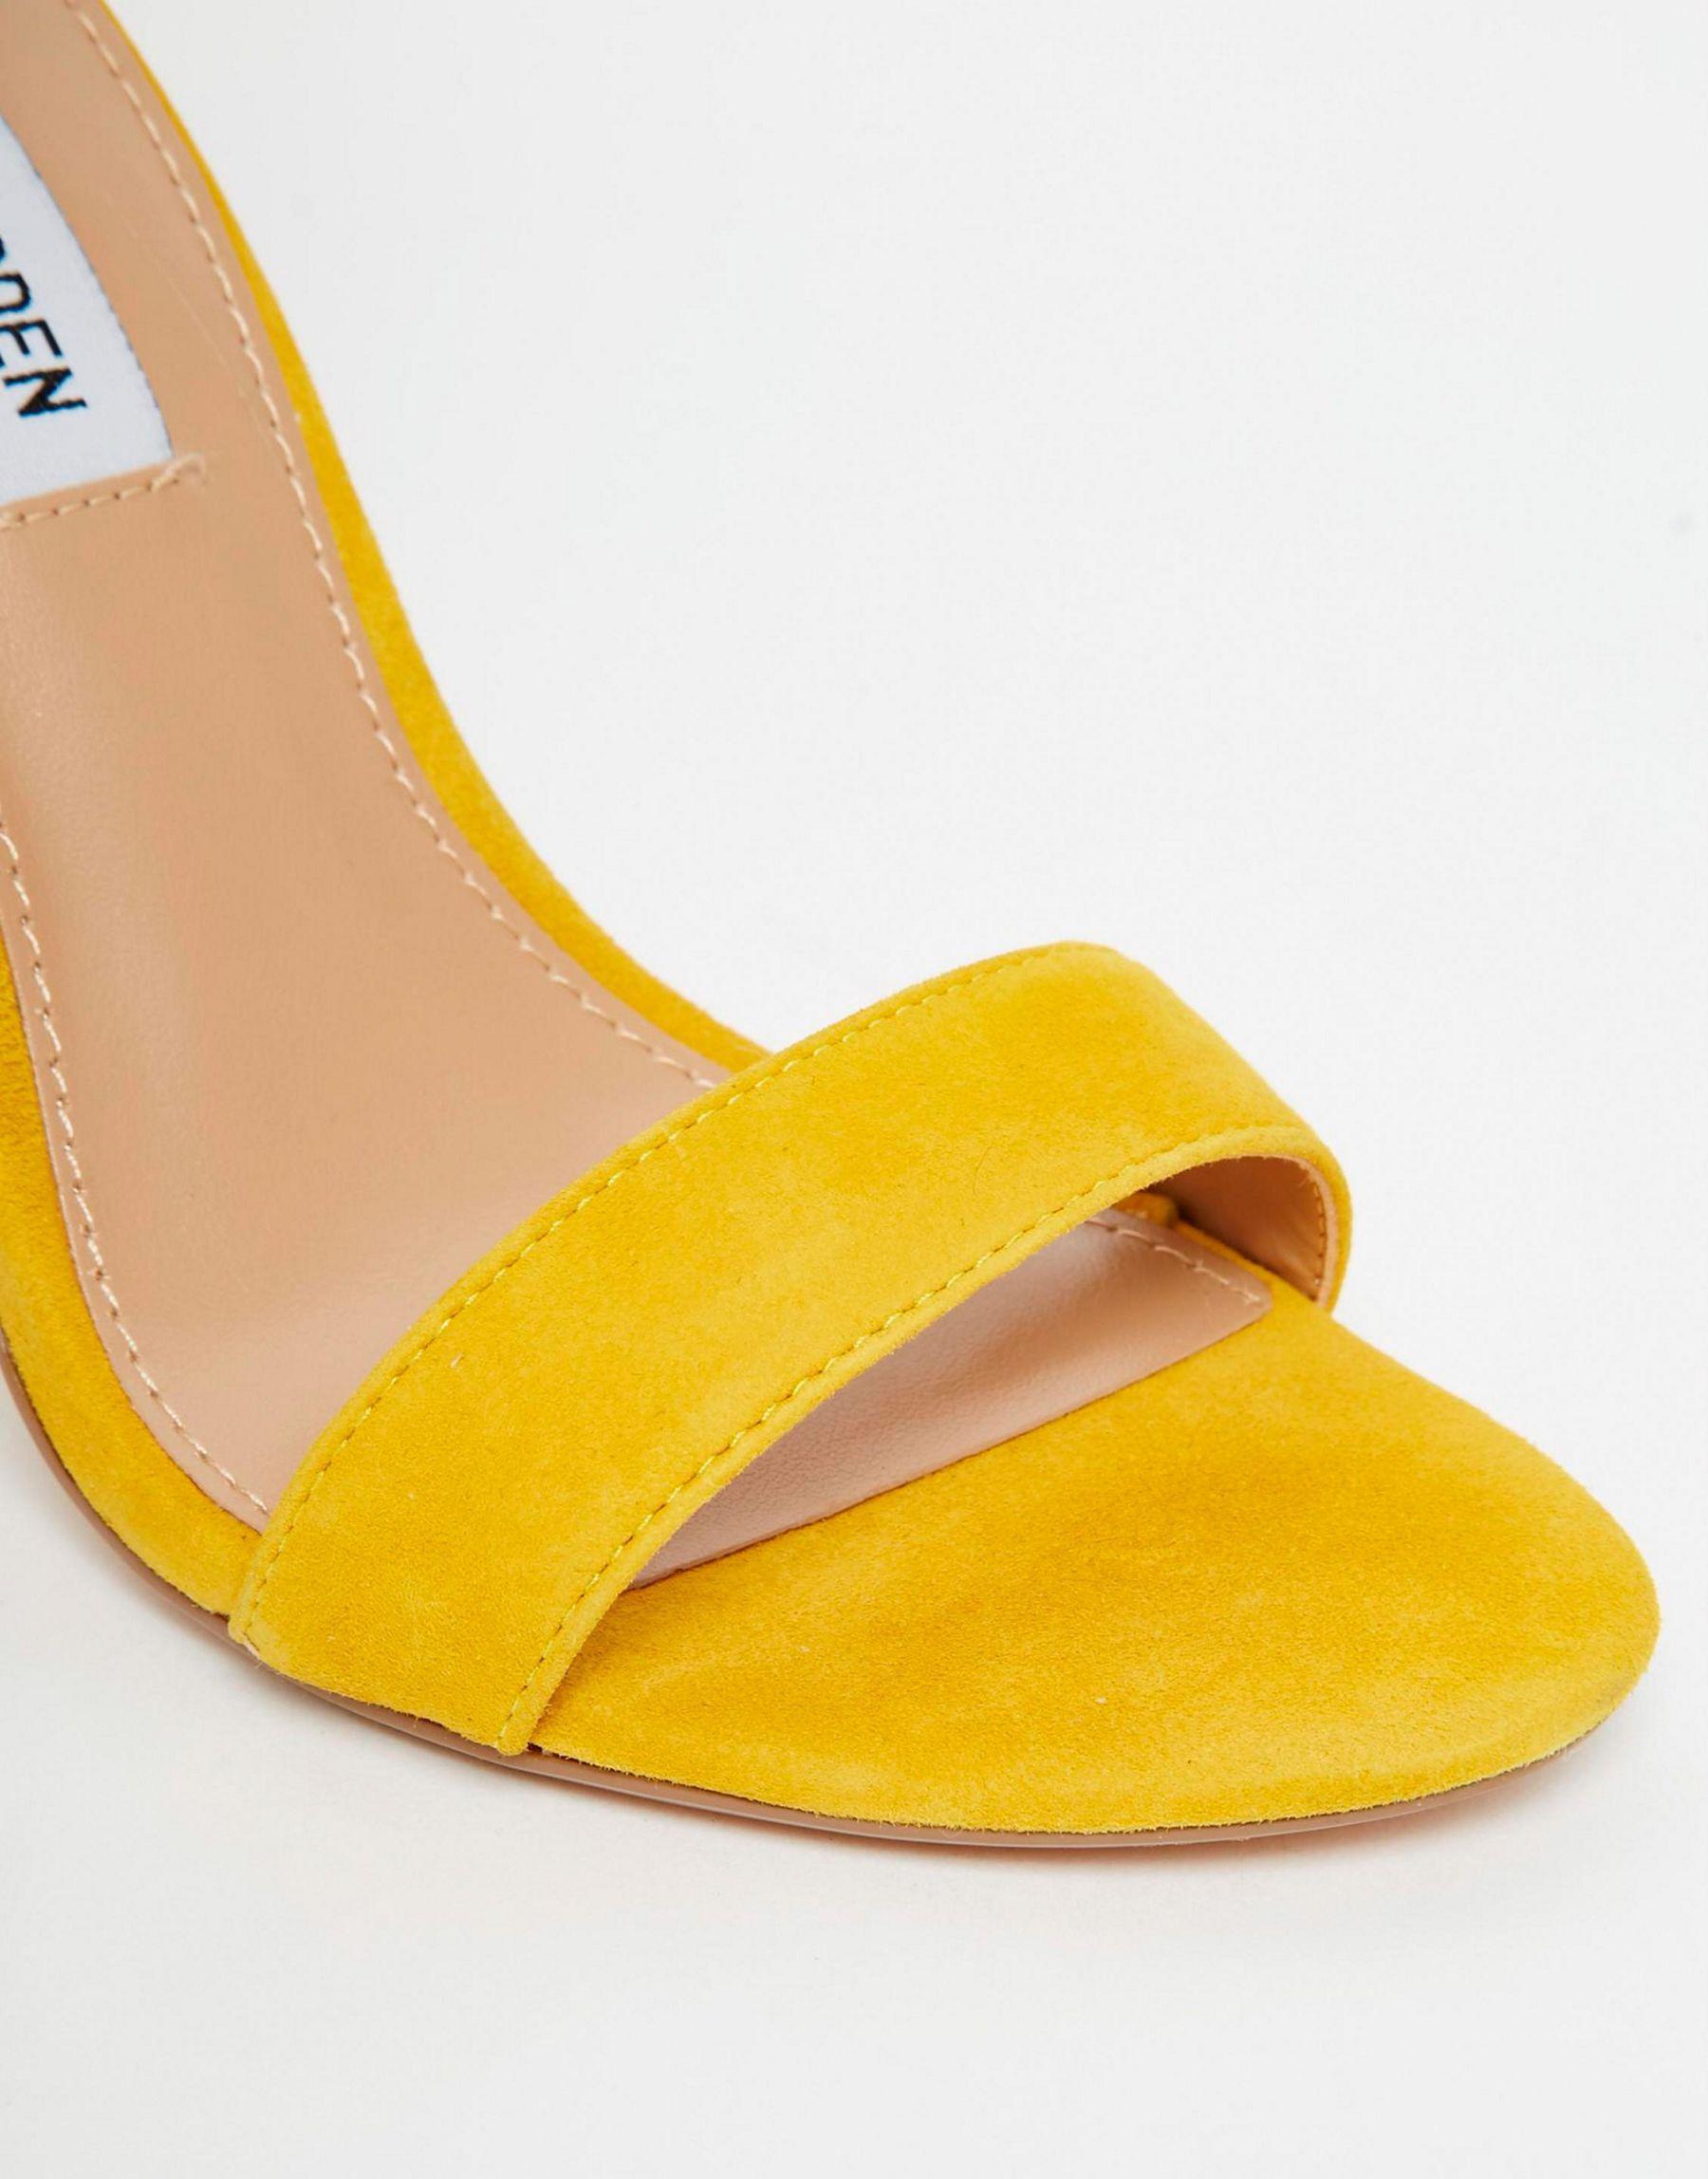 steve madden carrson yellow